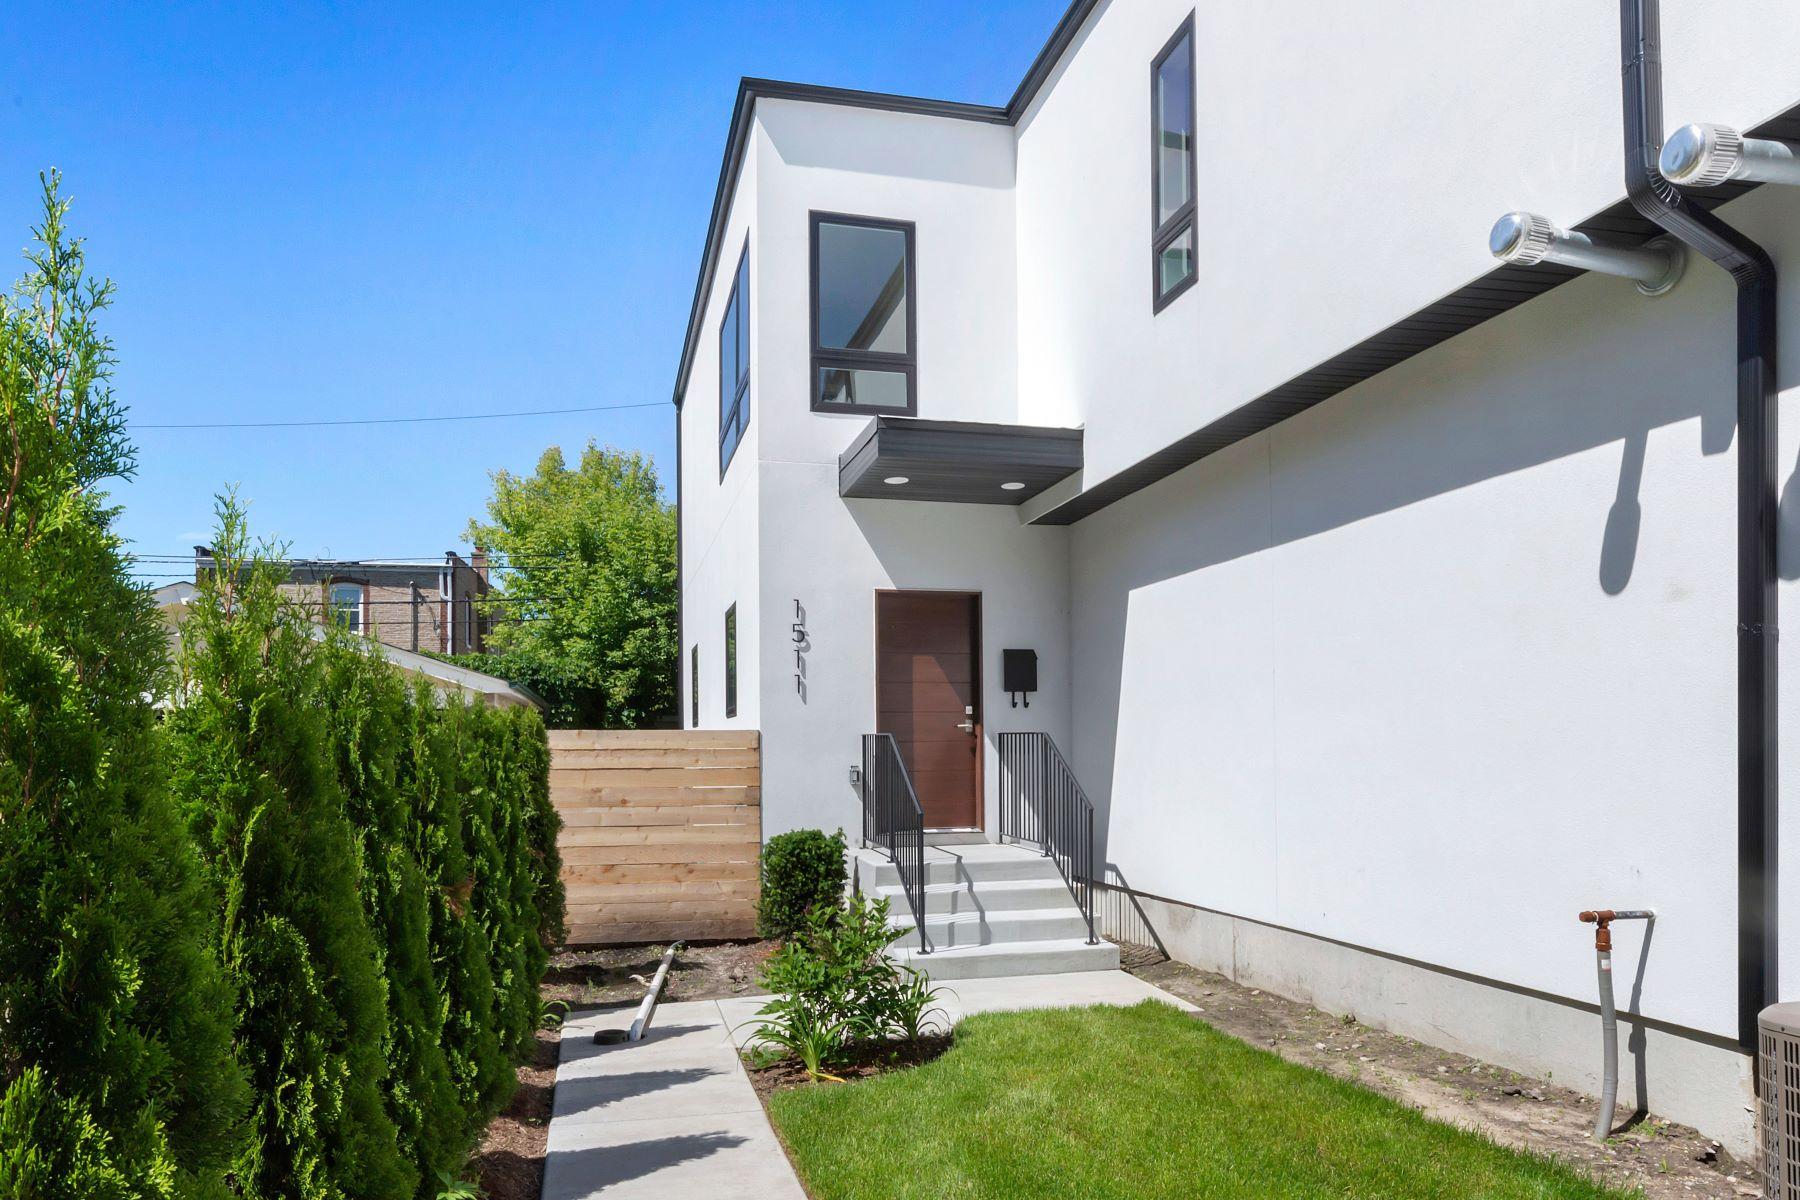 townhouses 为 销售 在 Stunning Evanston Home 1511 Wilder Street 埃文斯顿, 伊利诺斯州 60202 美国